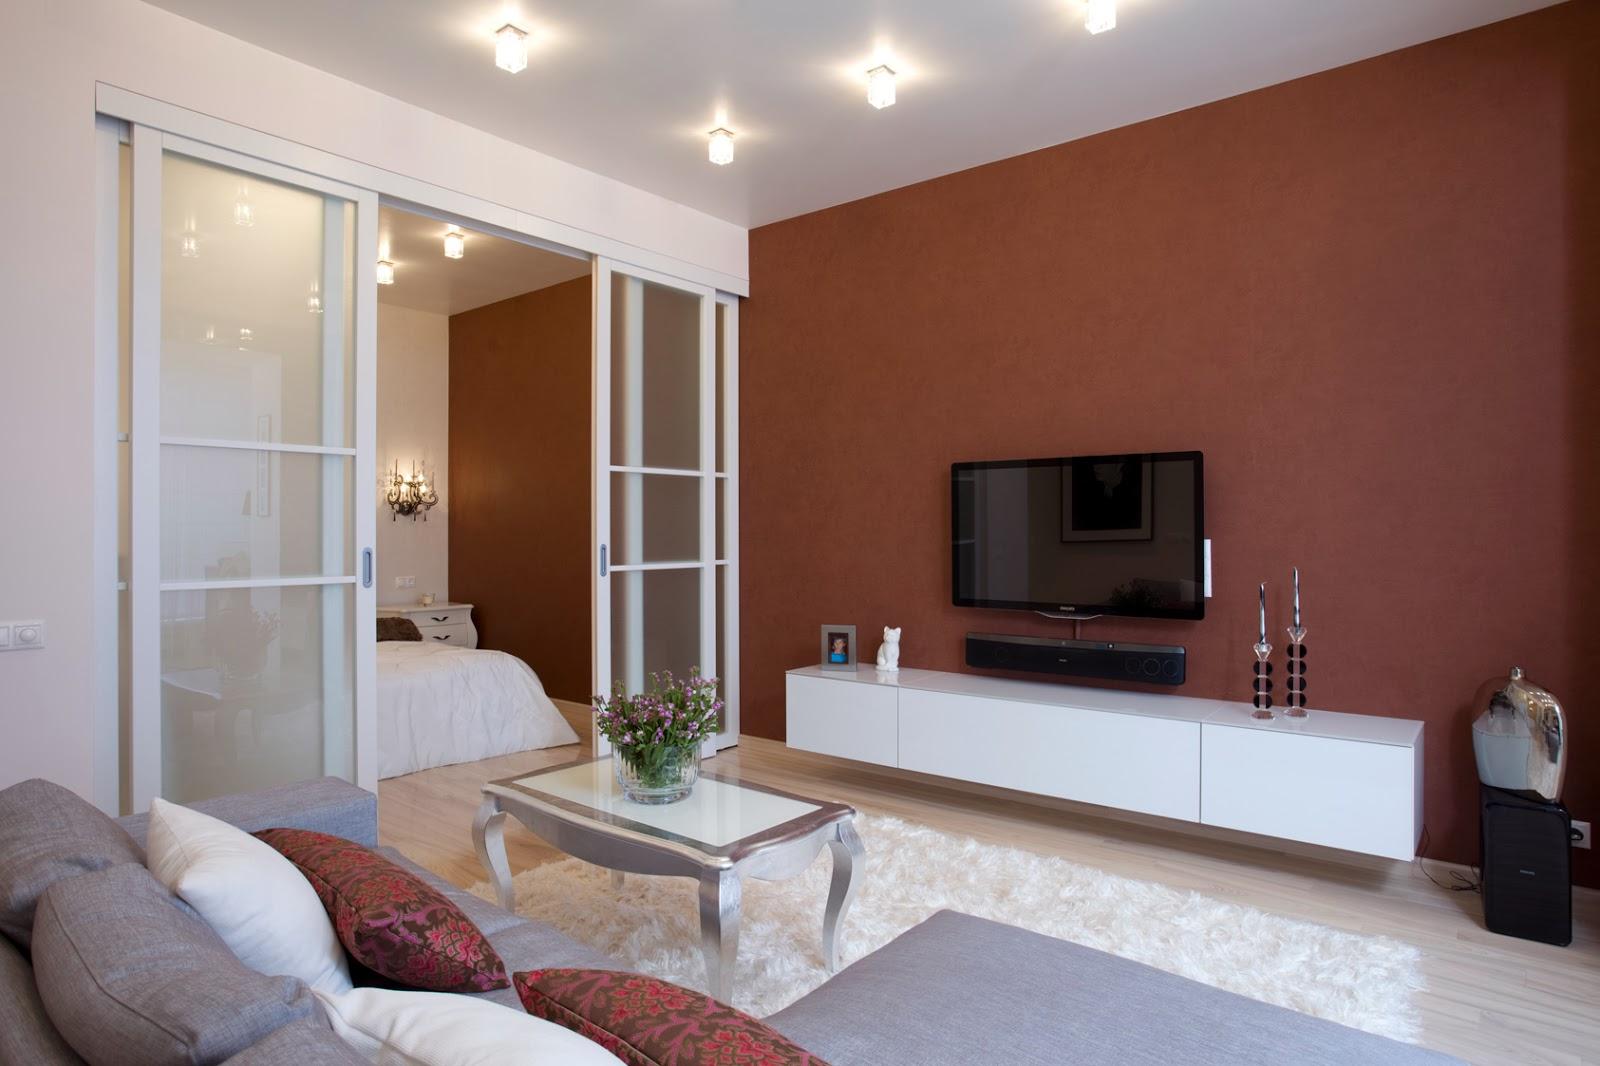 Однокомнатная квартира 40 кв м в стиле неоклассики